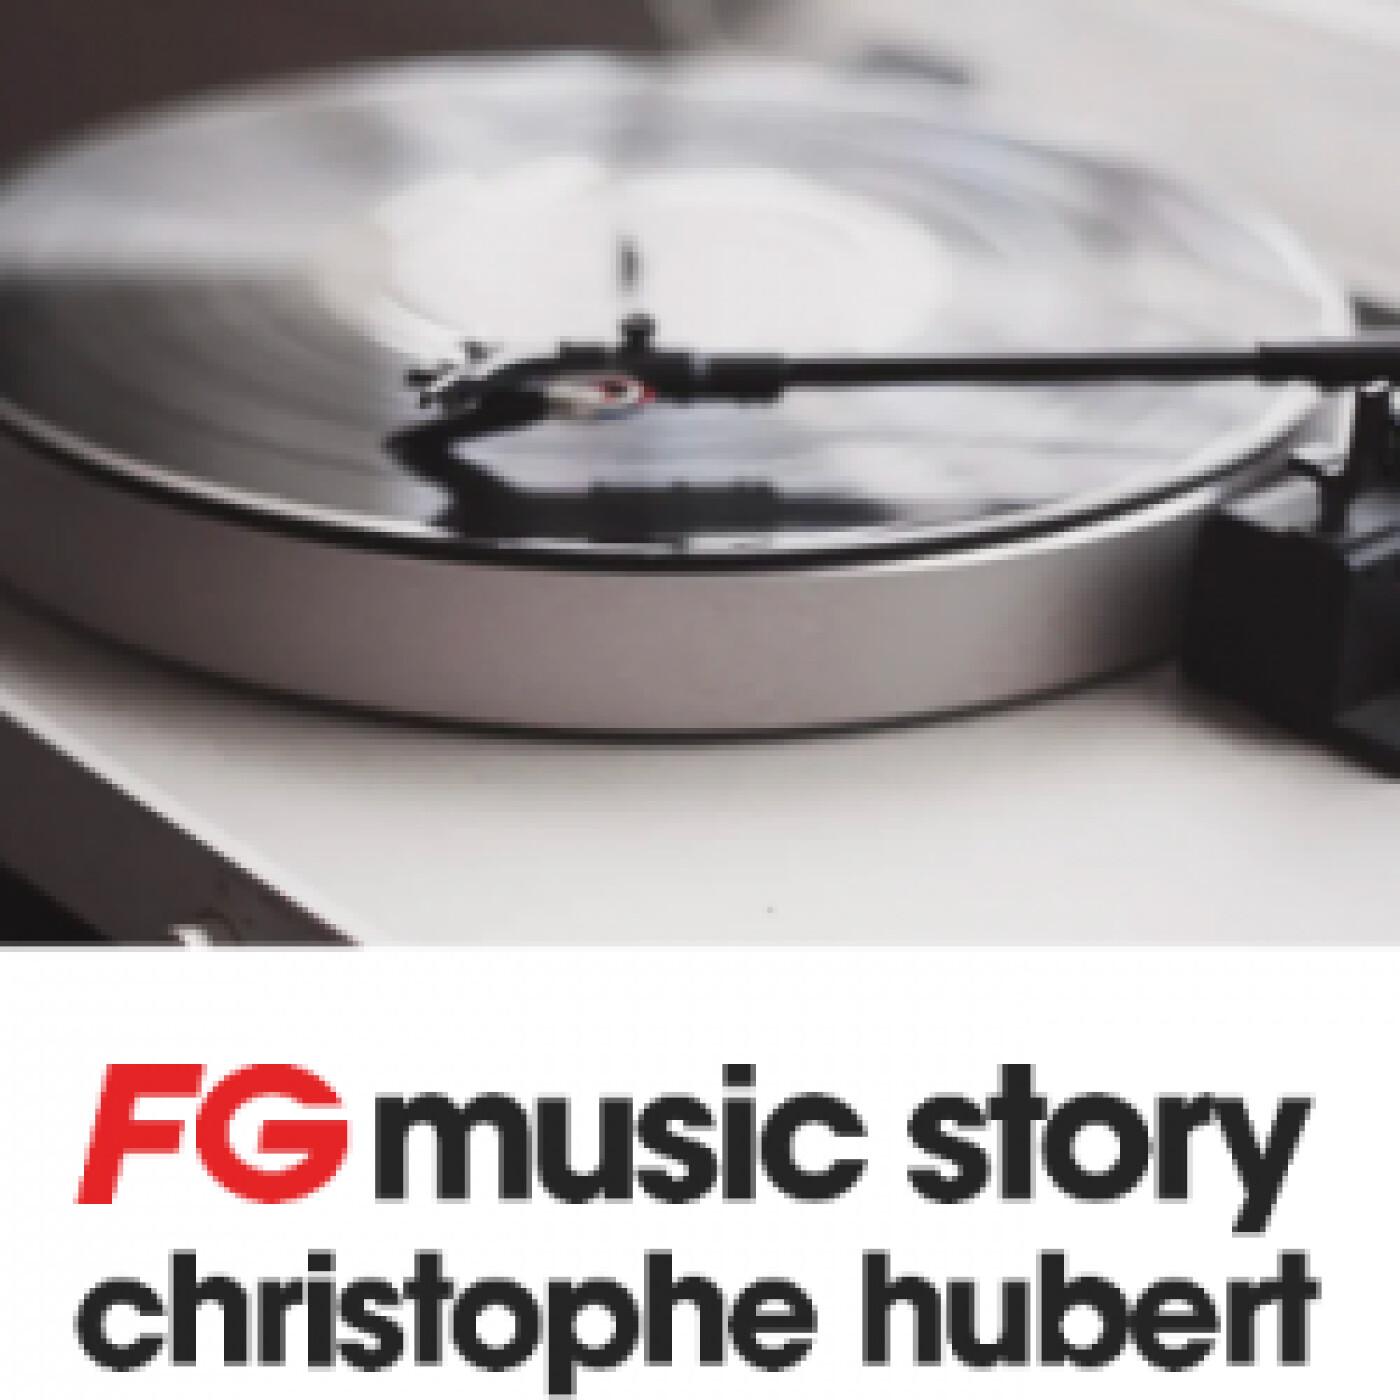 FG MUSIC STORY : NOIZU